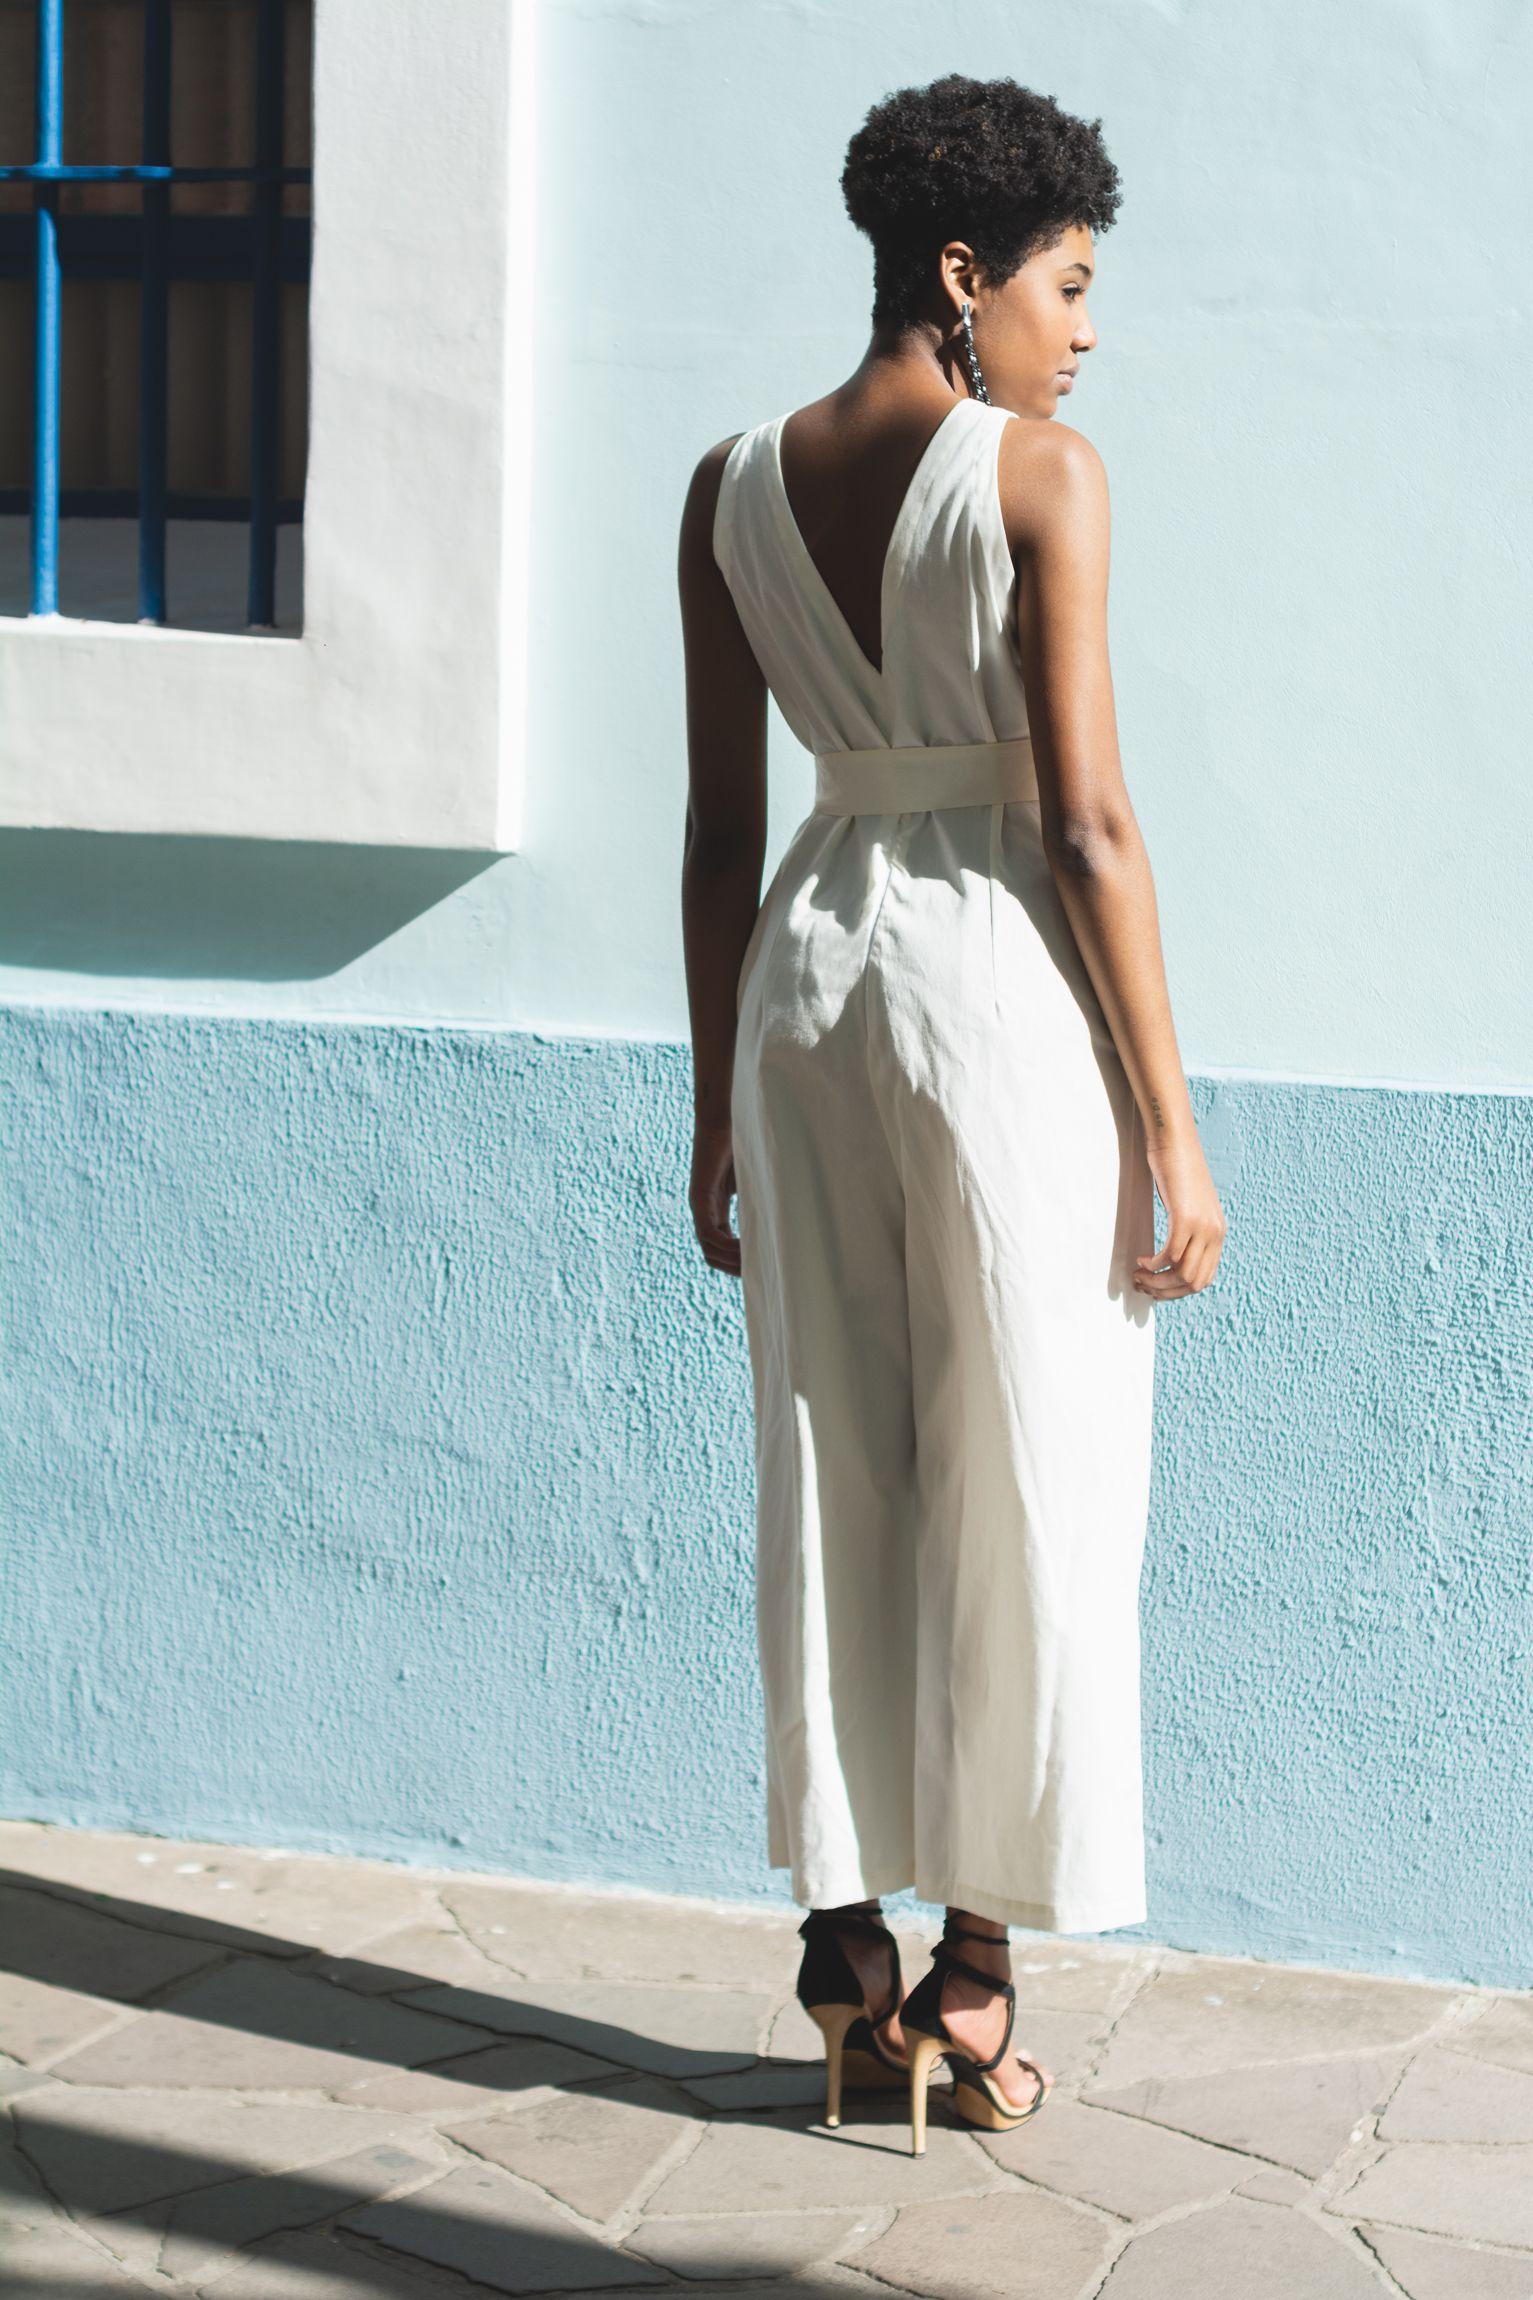 Macacao Pantacourt De Algodao Organico Da Brisa Slowfashion White Dress Fashion Jumpsuit